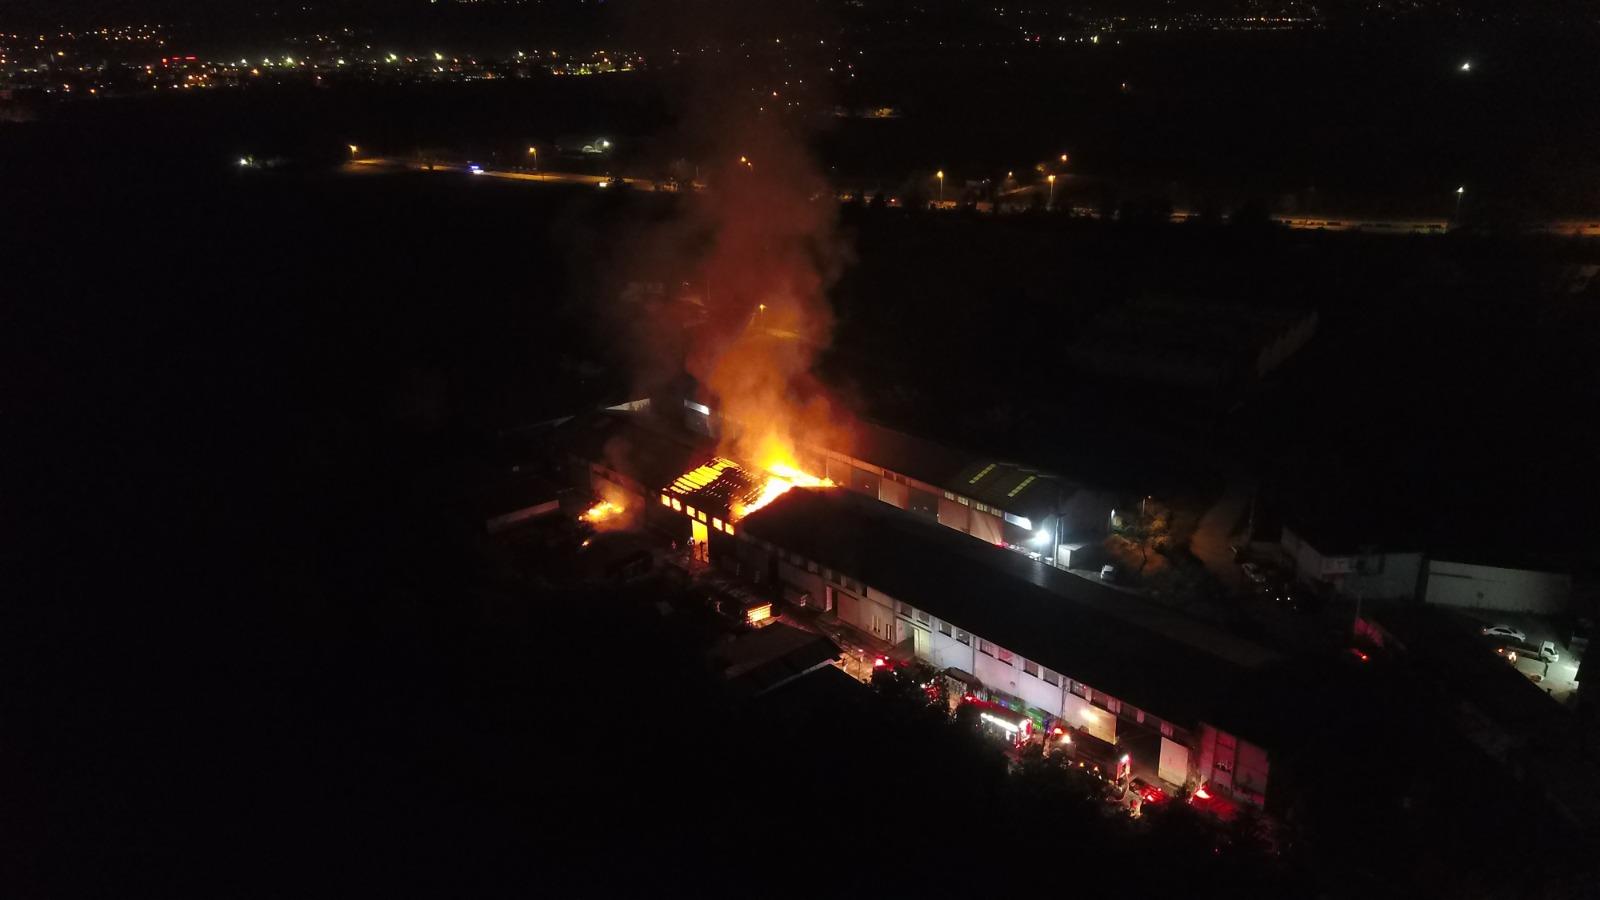 Ambalaj fabrikasında yangın